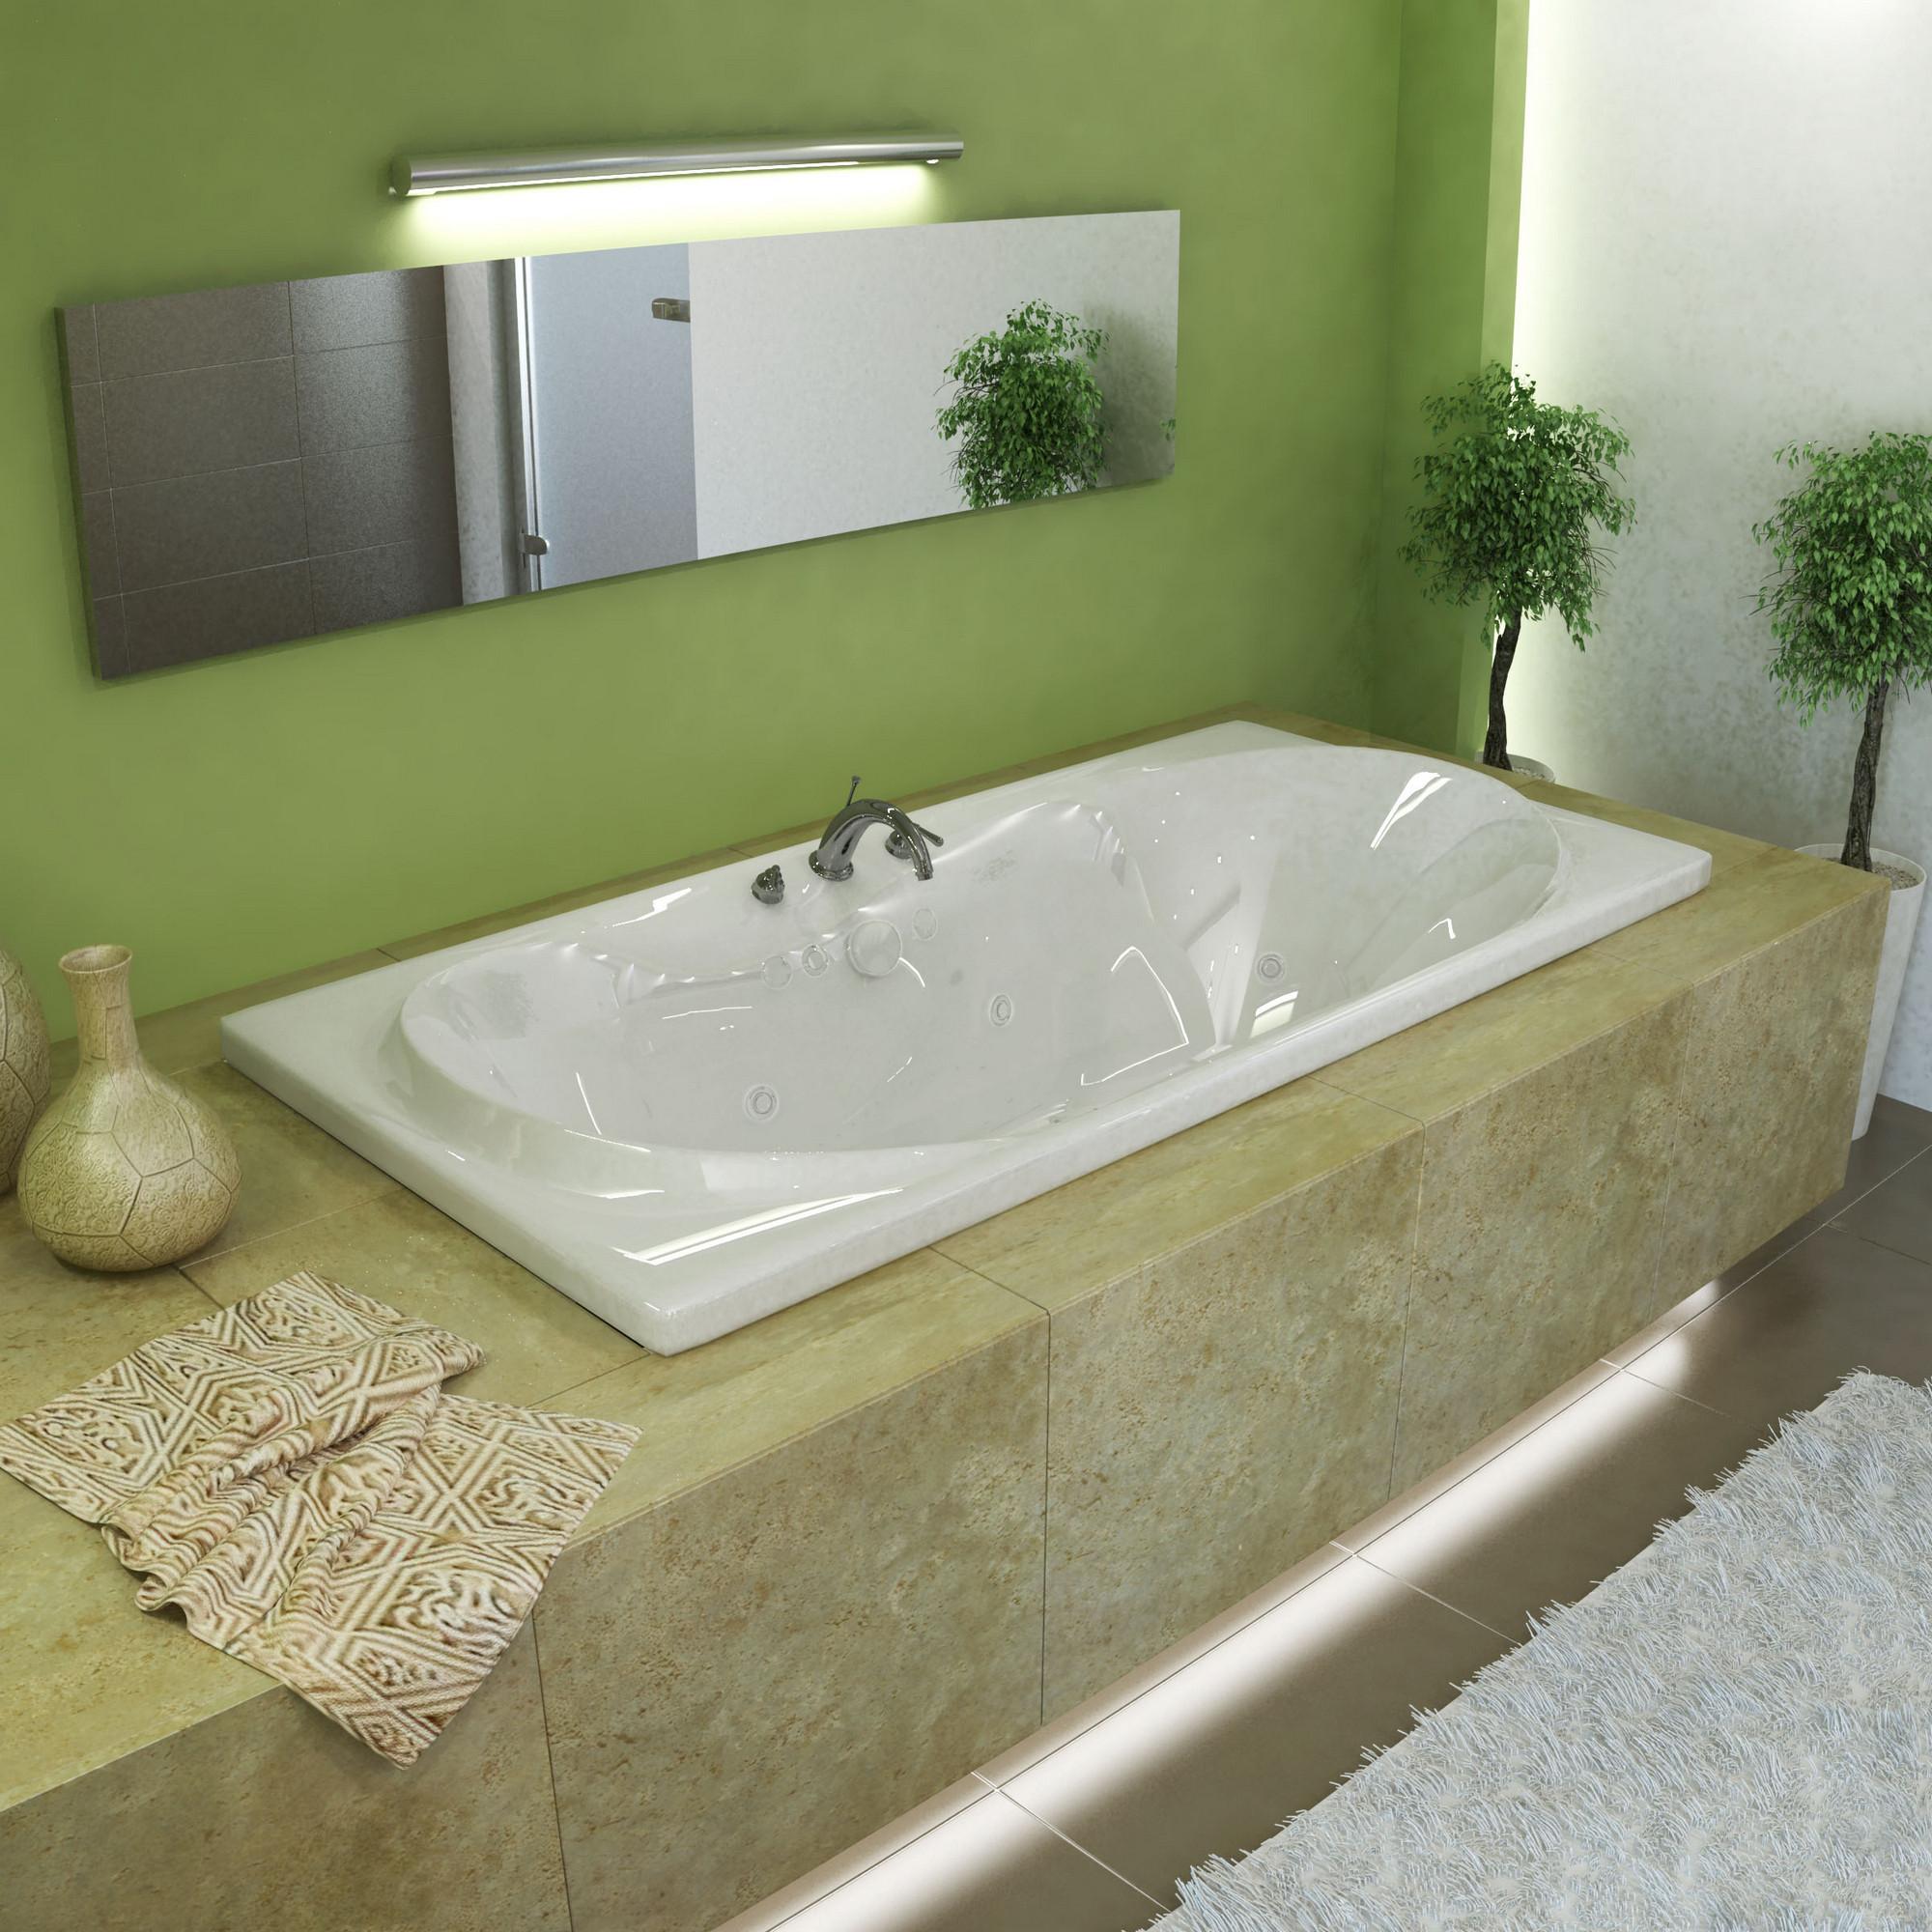 MediTub 4272WDR Atlantis Whisper Air & Whirlpool Bathtub With Right Pump